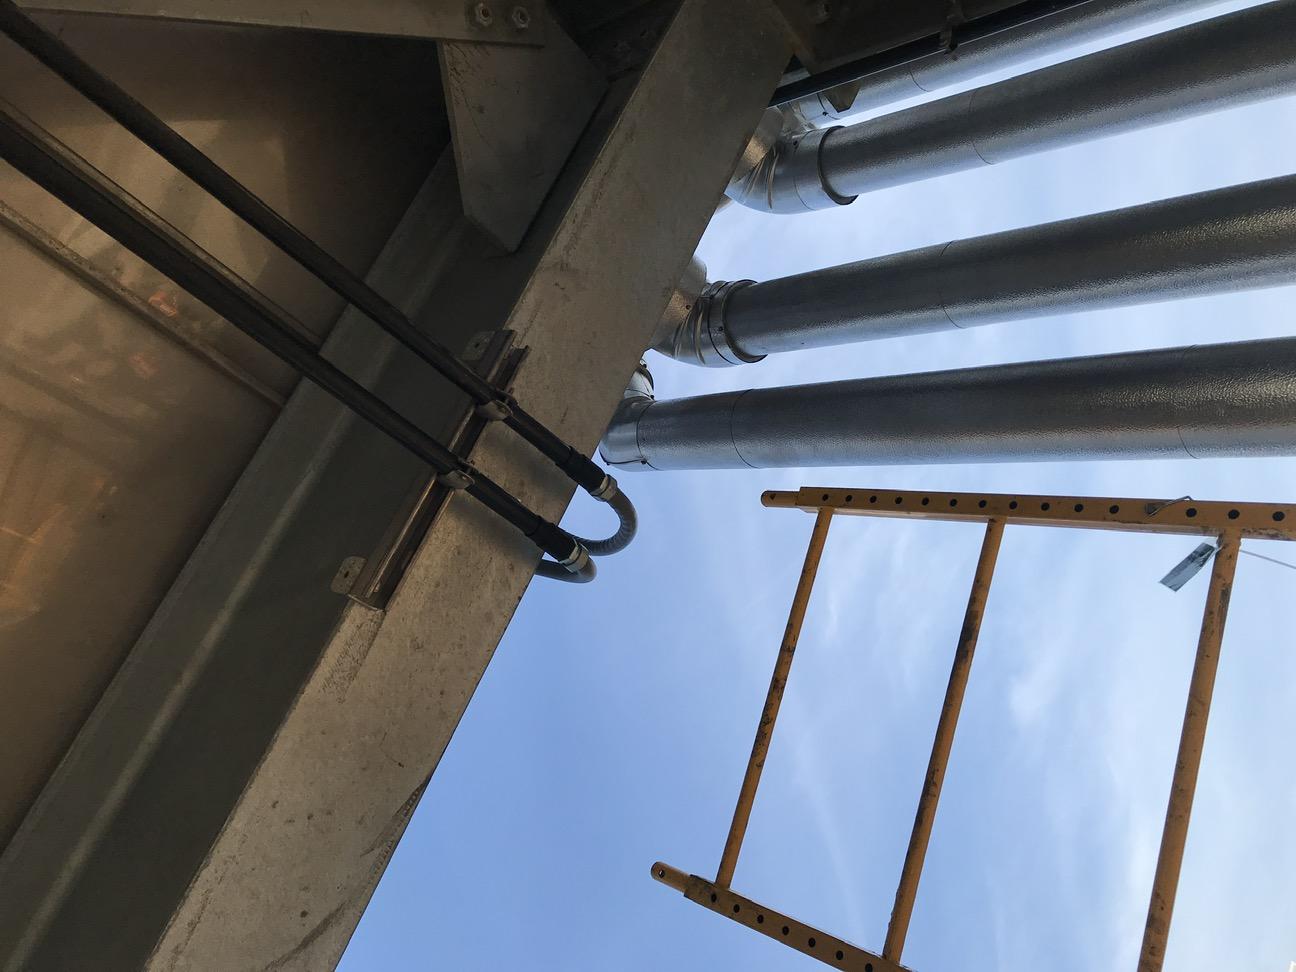 Stainless Steel on Galvanized Unistrut-ab7f9448-4d94-43eb-8fcf-c74e3224126c.jpg